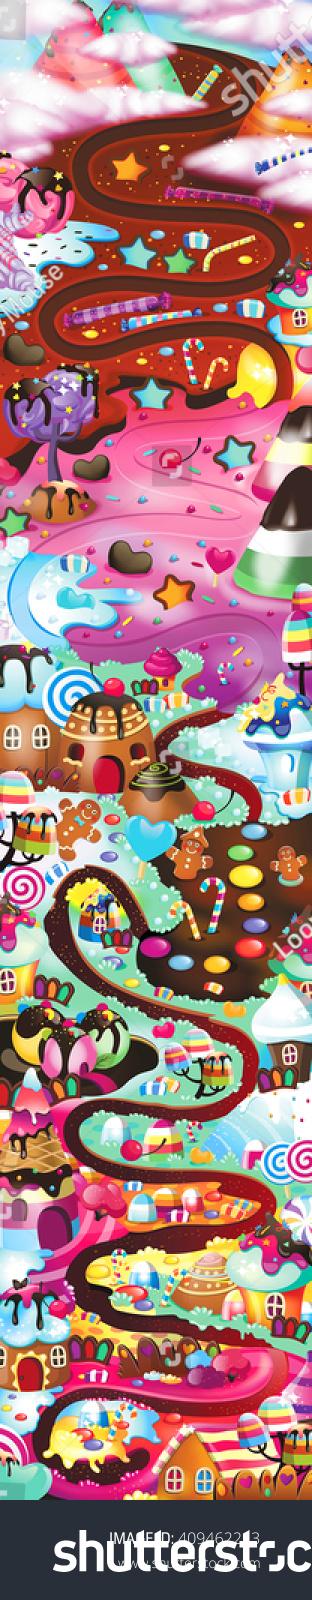 Candyland Map on